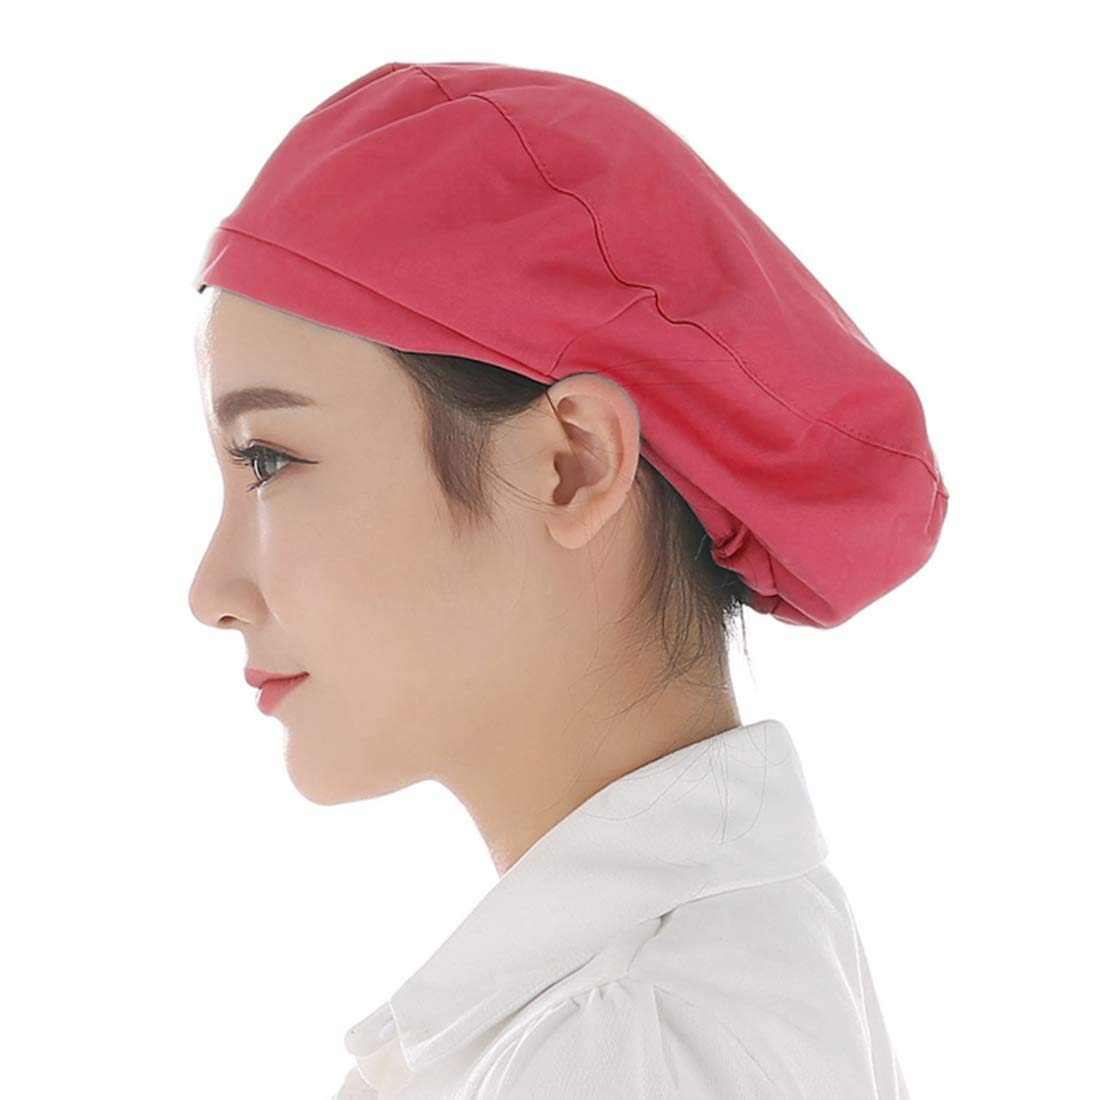 Jiyaru Chef Cap Skin-Friendly Cook Hat Reusable Restaurant Workshop Hats